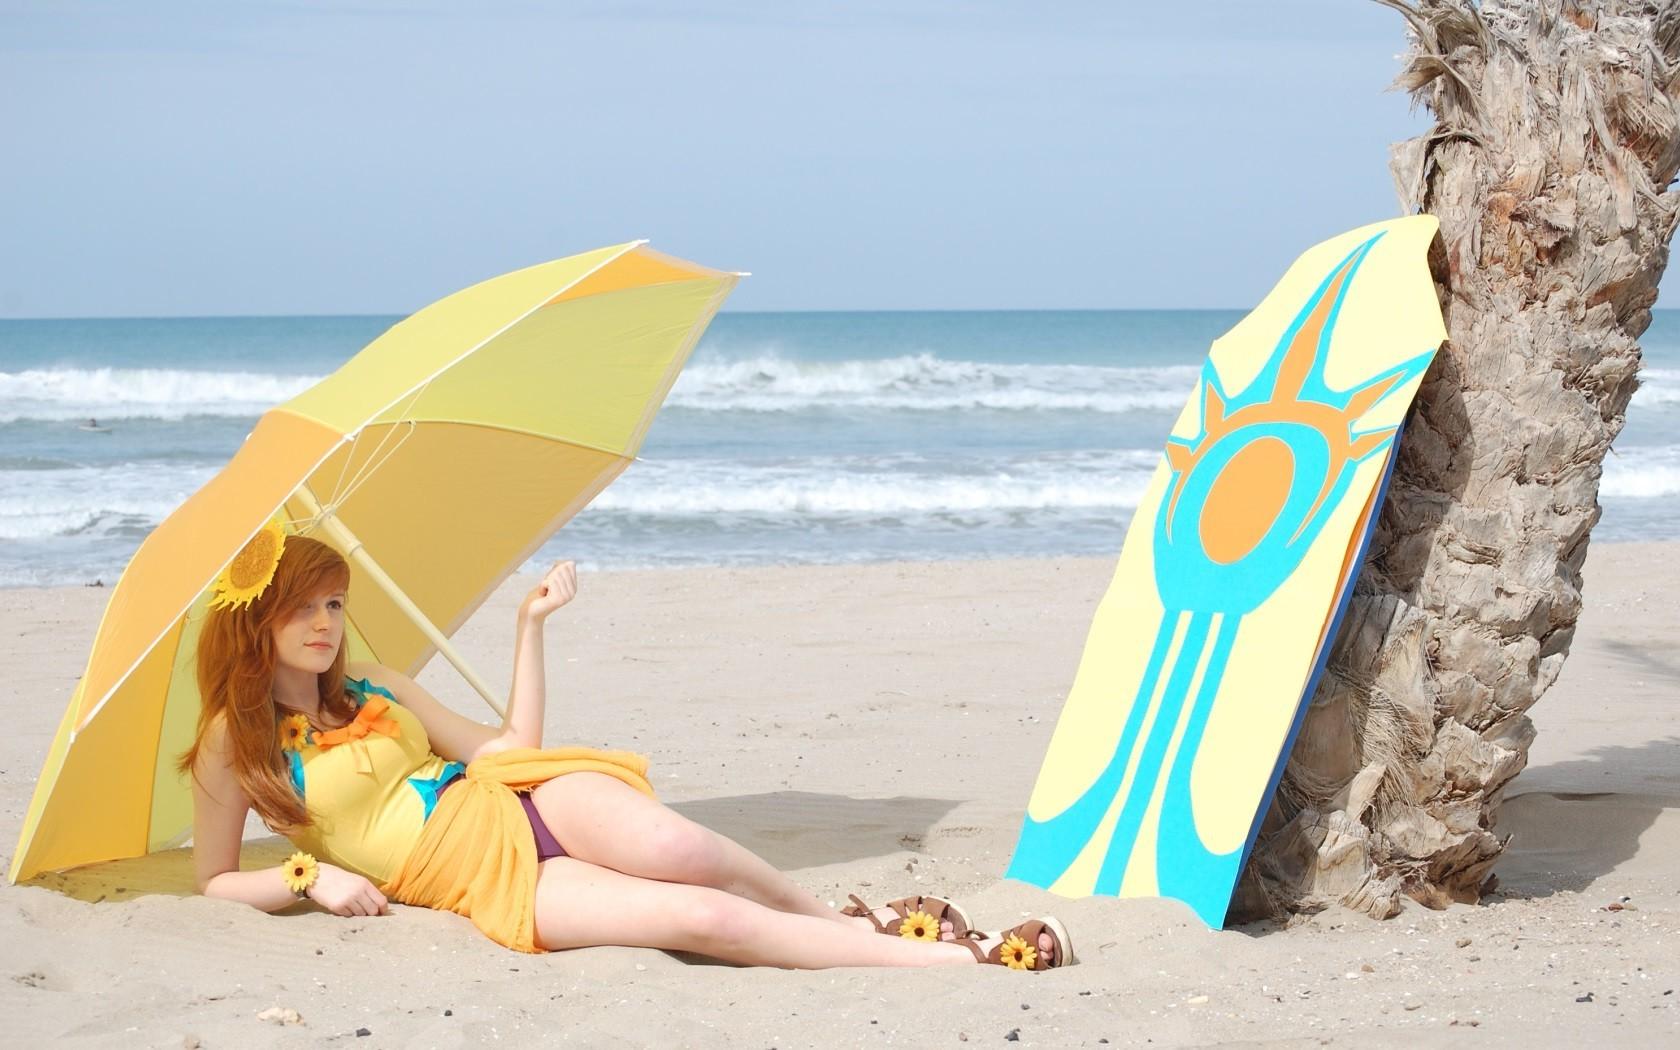 Wallpaper Sea Sand League Of Legends Beach Coast